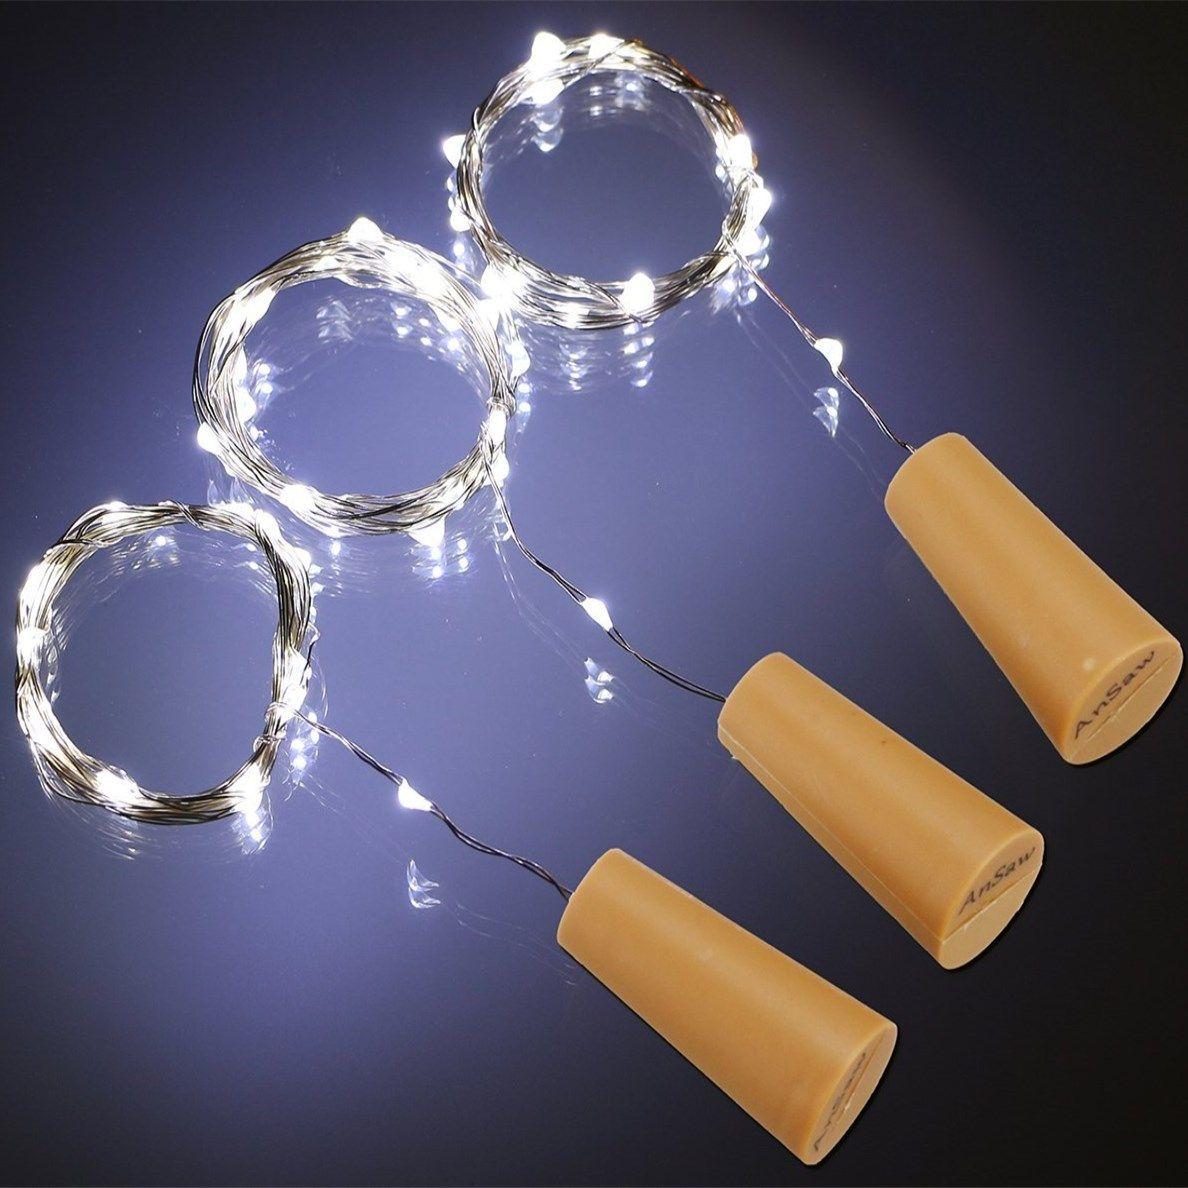 2M 20LED Lamp Cork Shaped Bottle Stopper Light Glass Wine LED Copper Wire String Lights Bottle Lights For Christmas Party Wedding Halloween